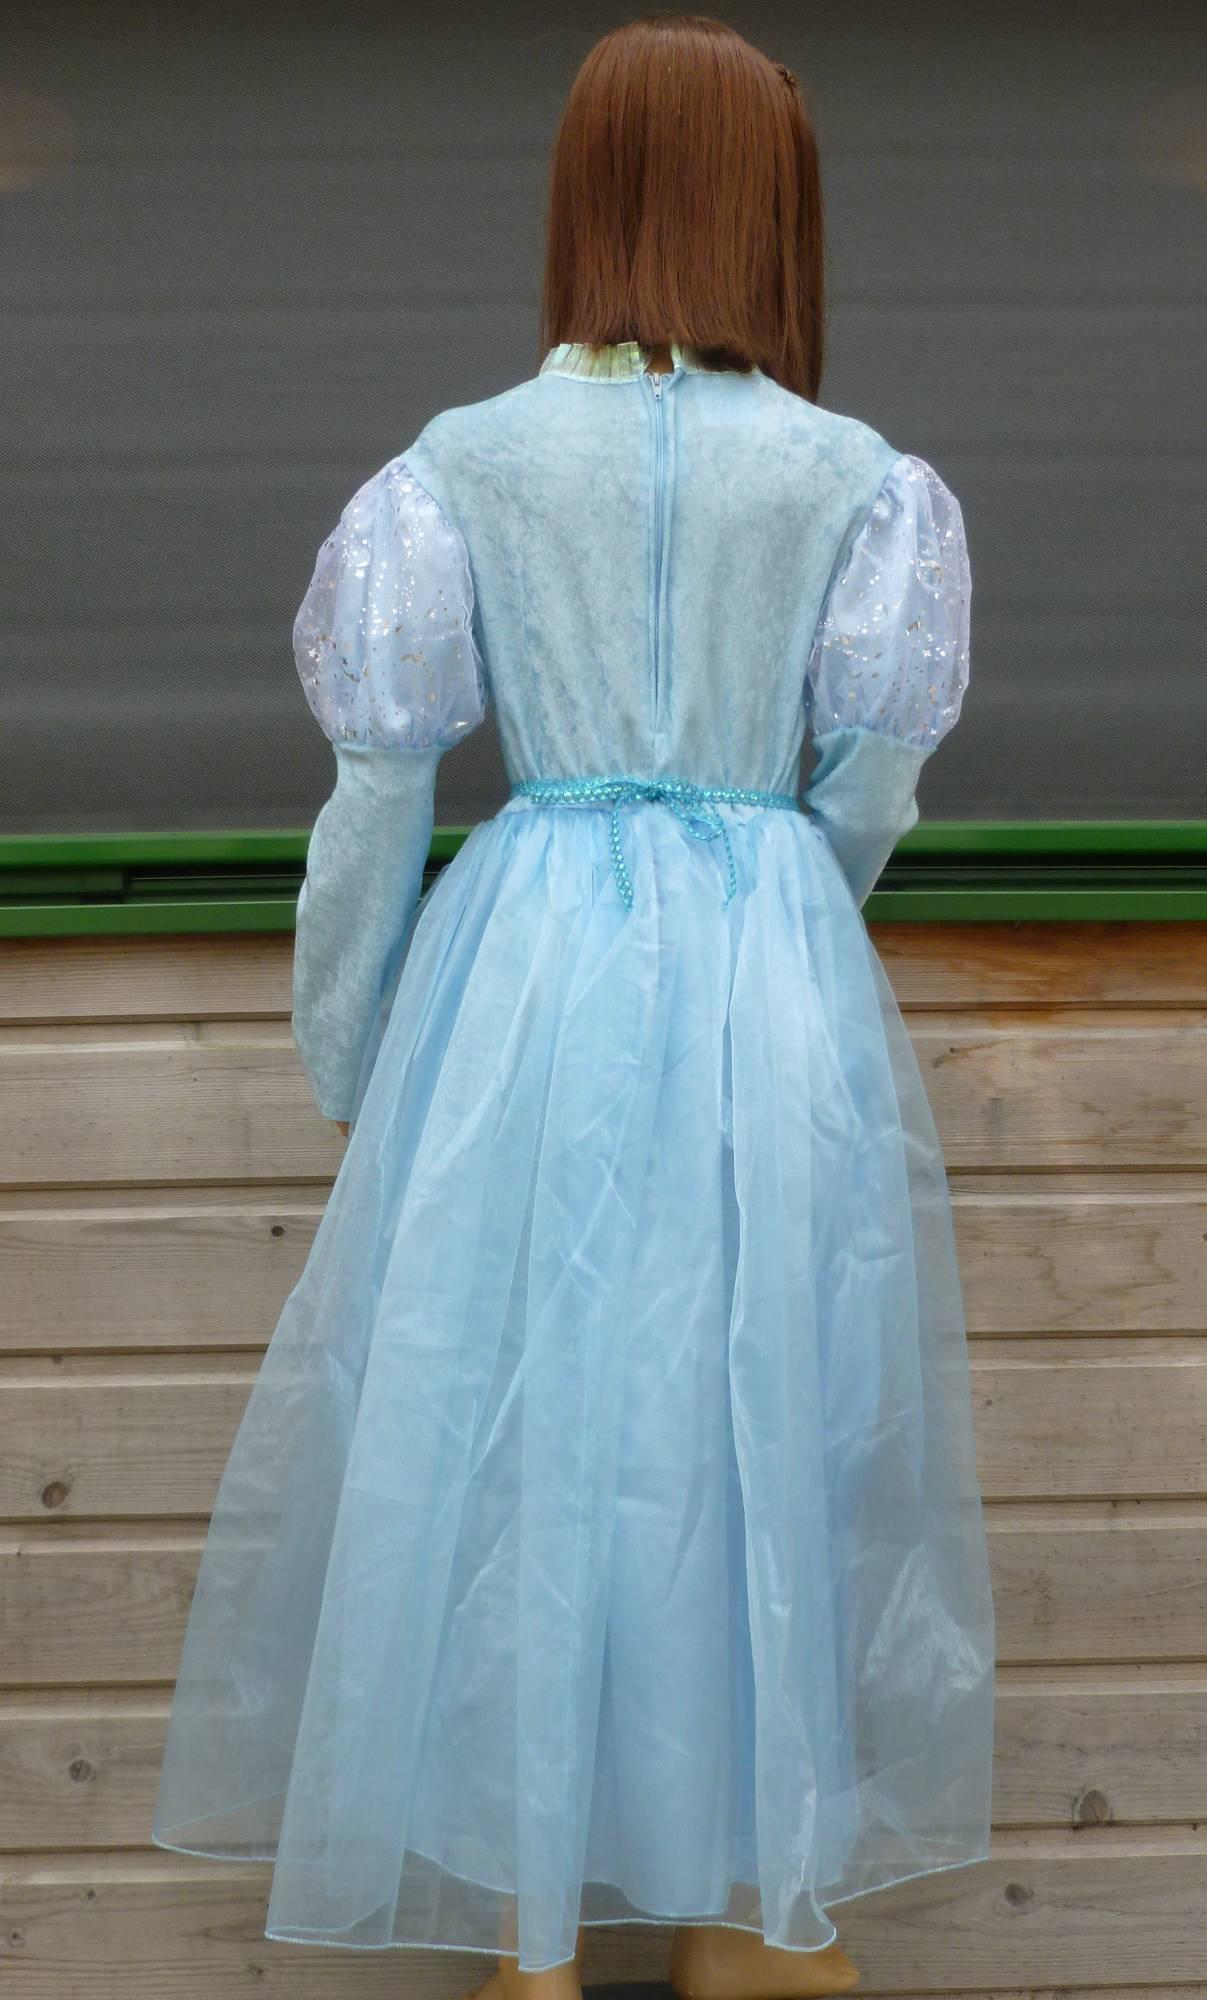 Costume-Princesse-Bleue-Fille-2